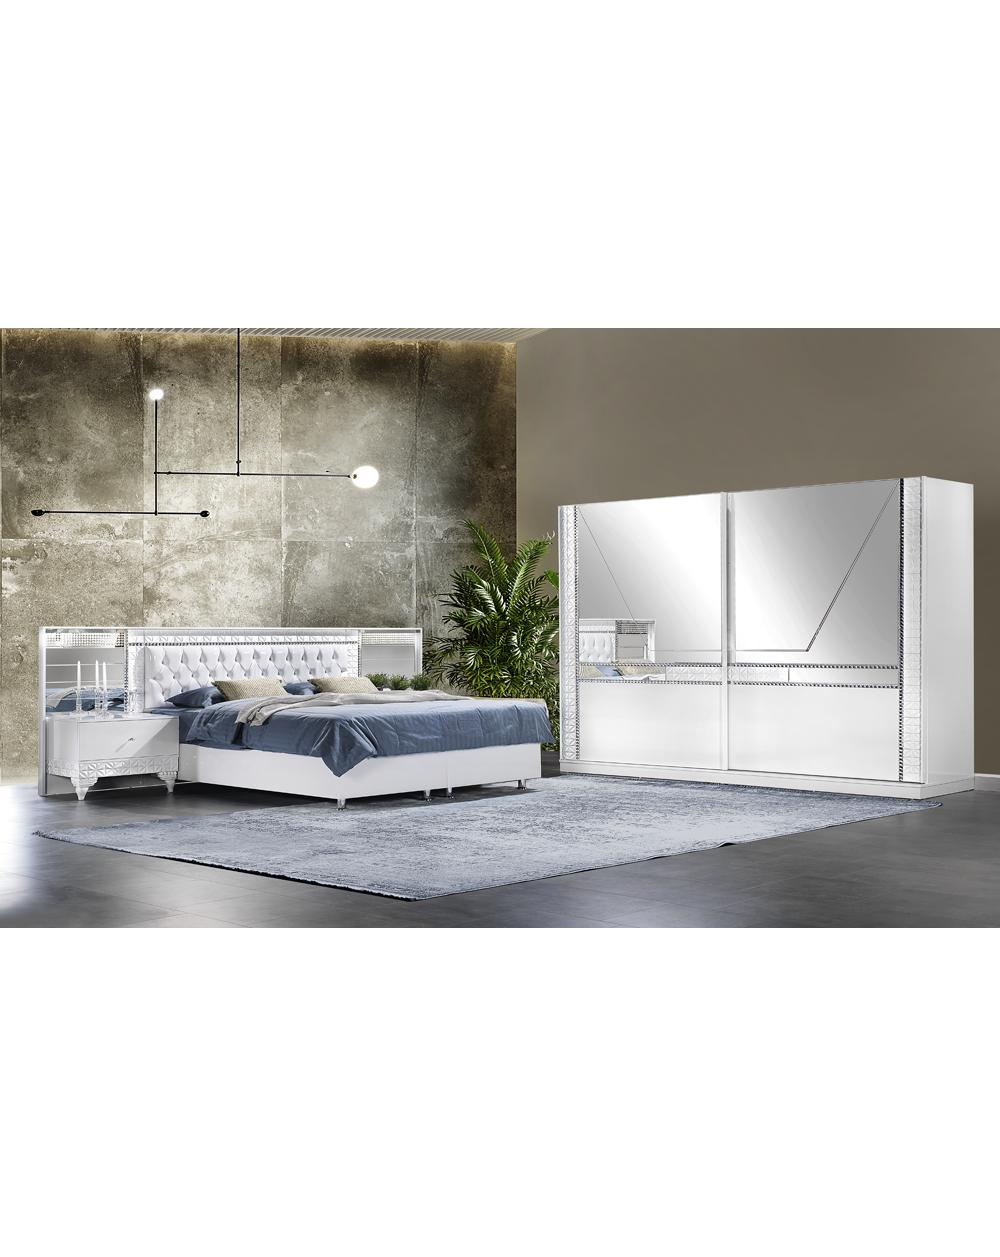 Safran Moderne Komplett Schlafzimmer